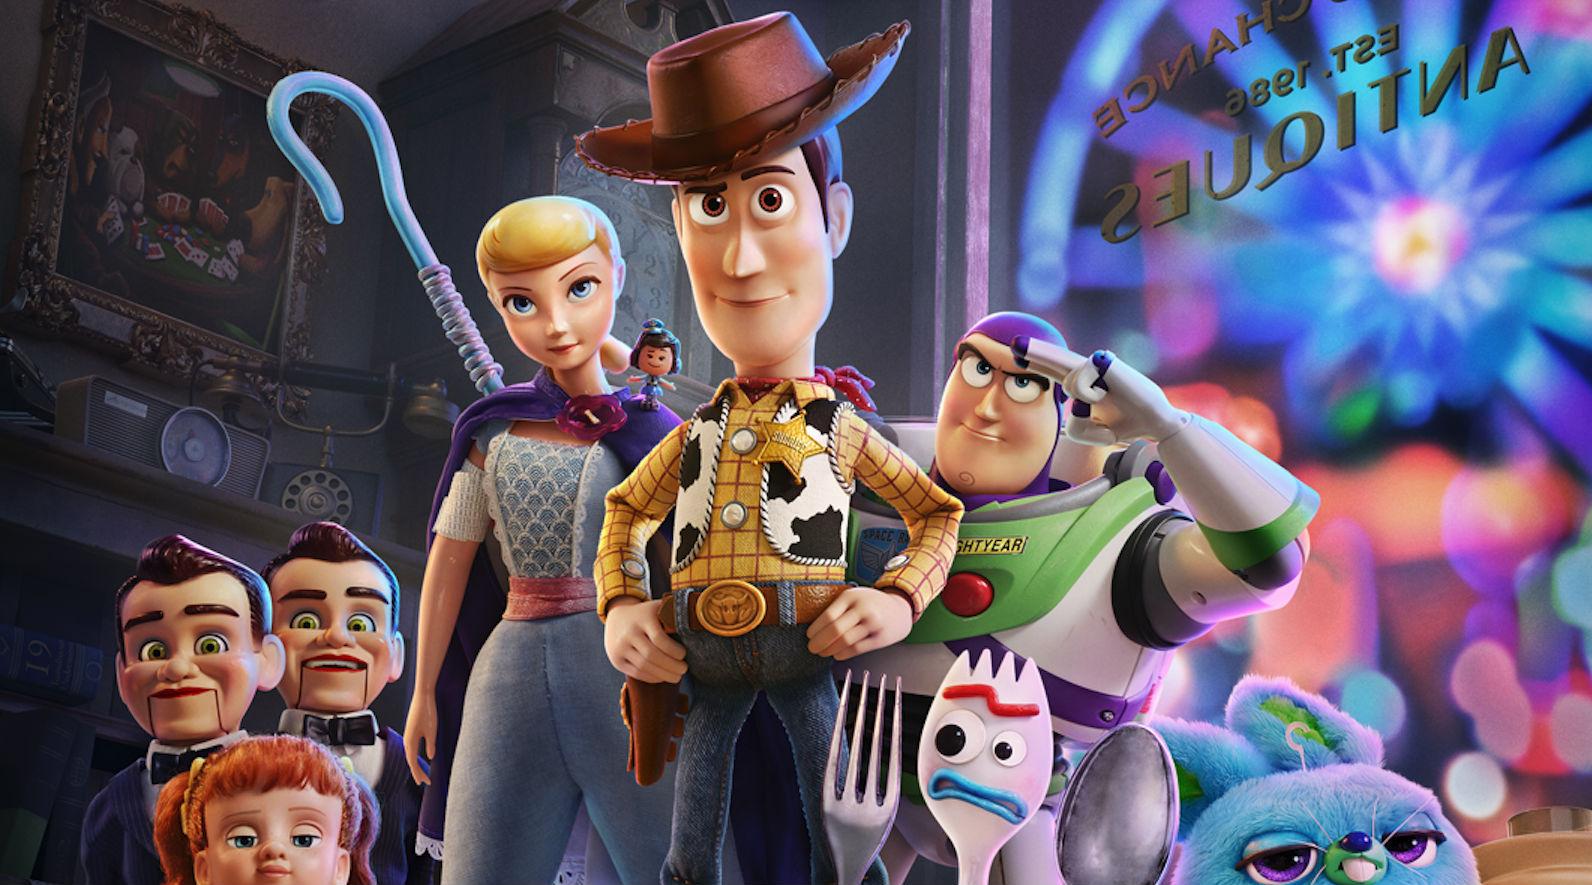 Toy Story 4, Disney/Pixar, June 21